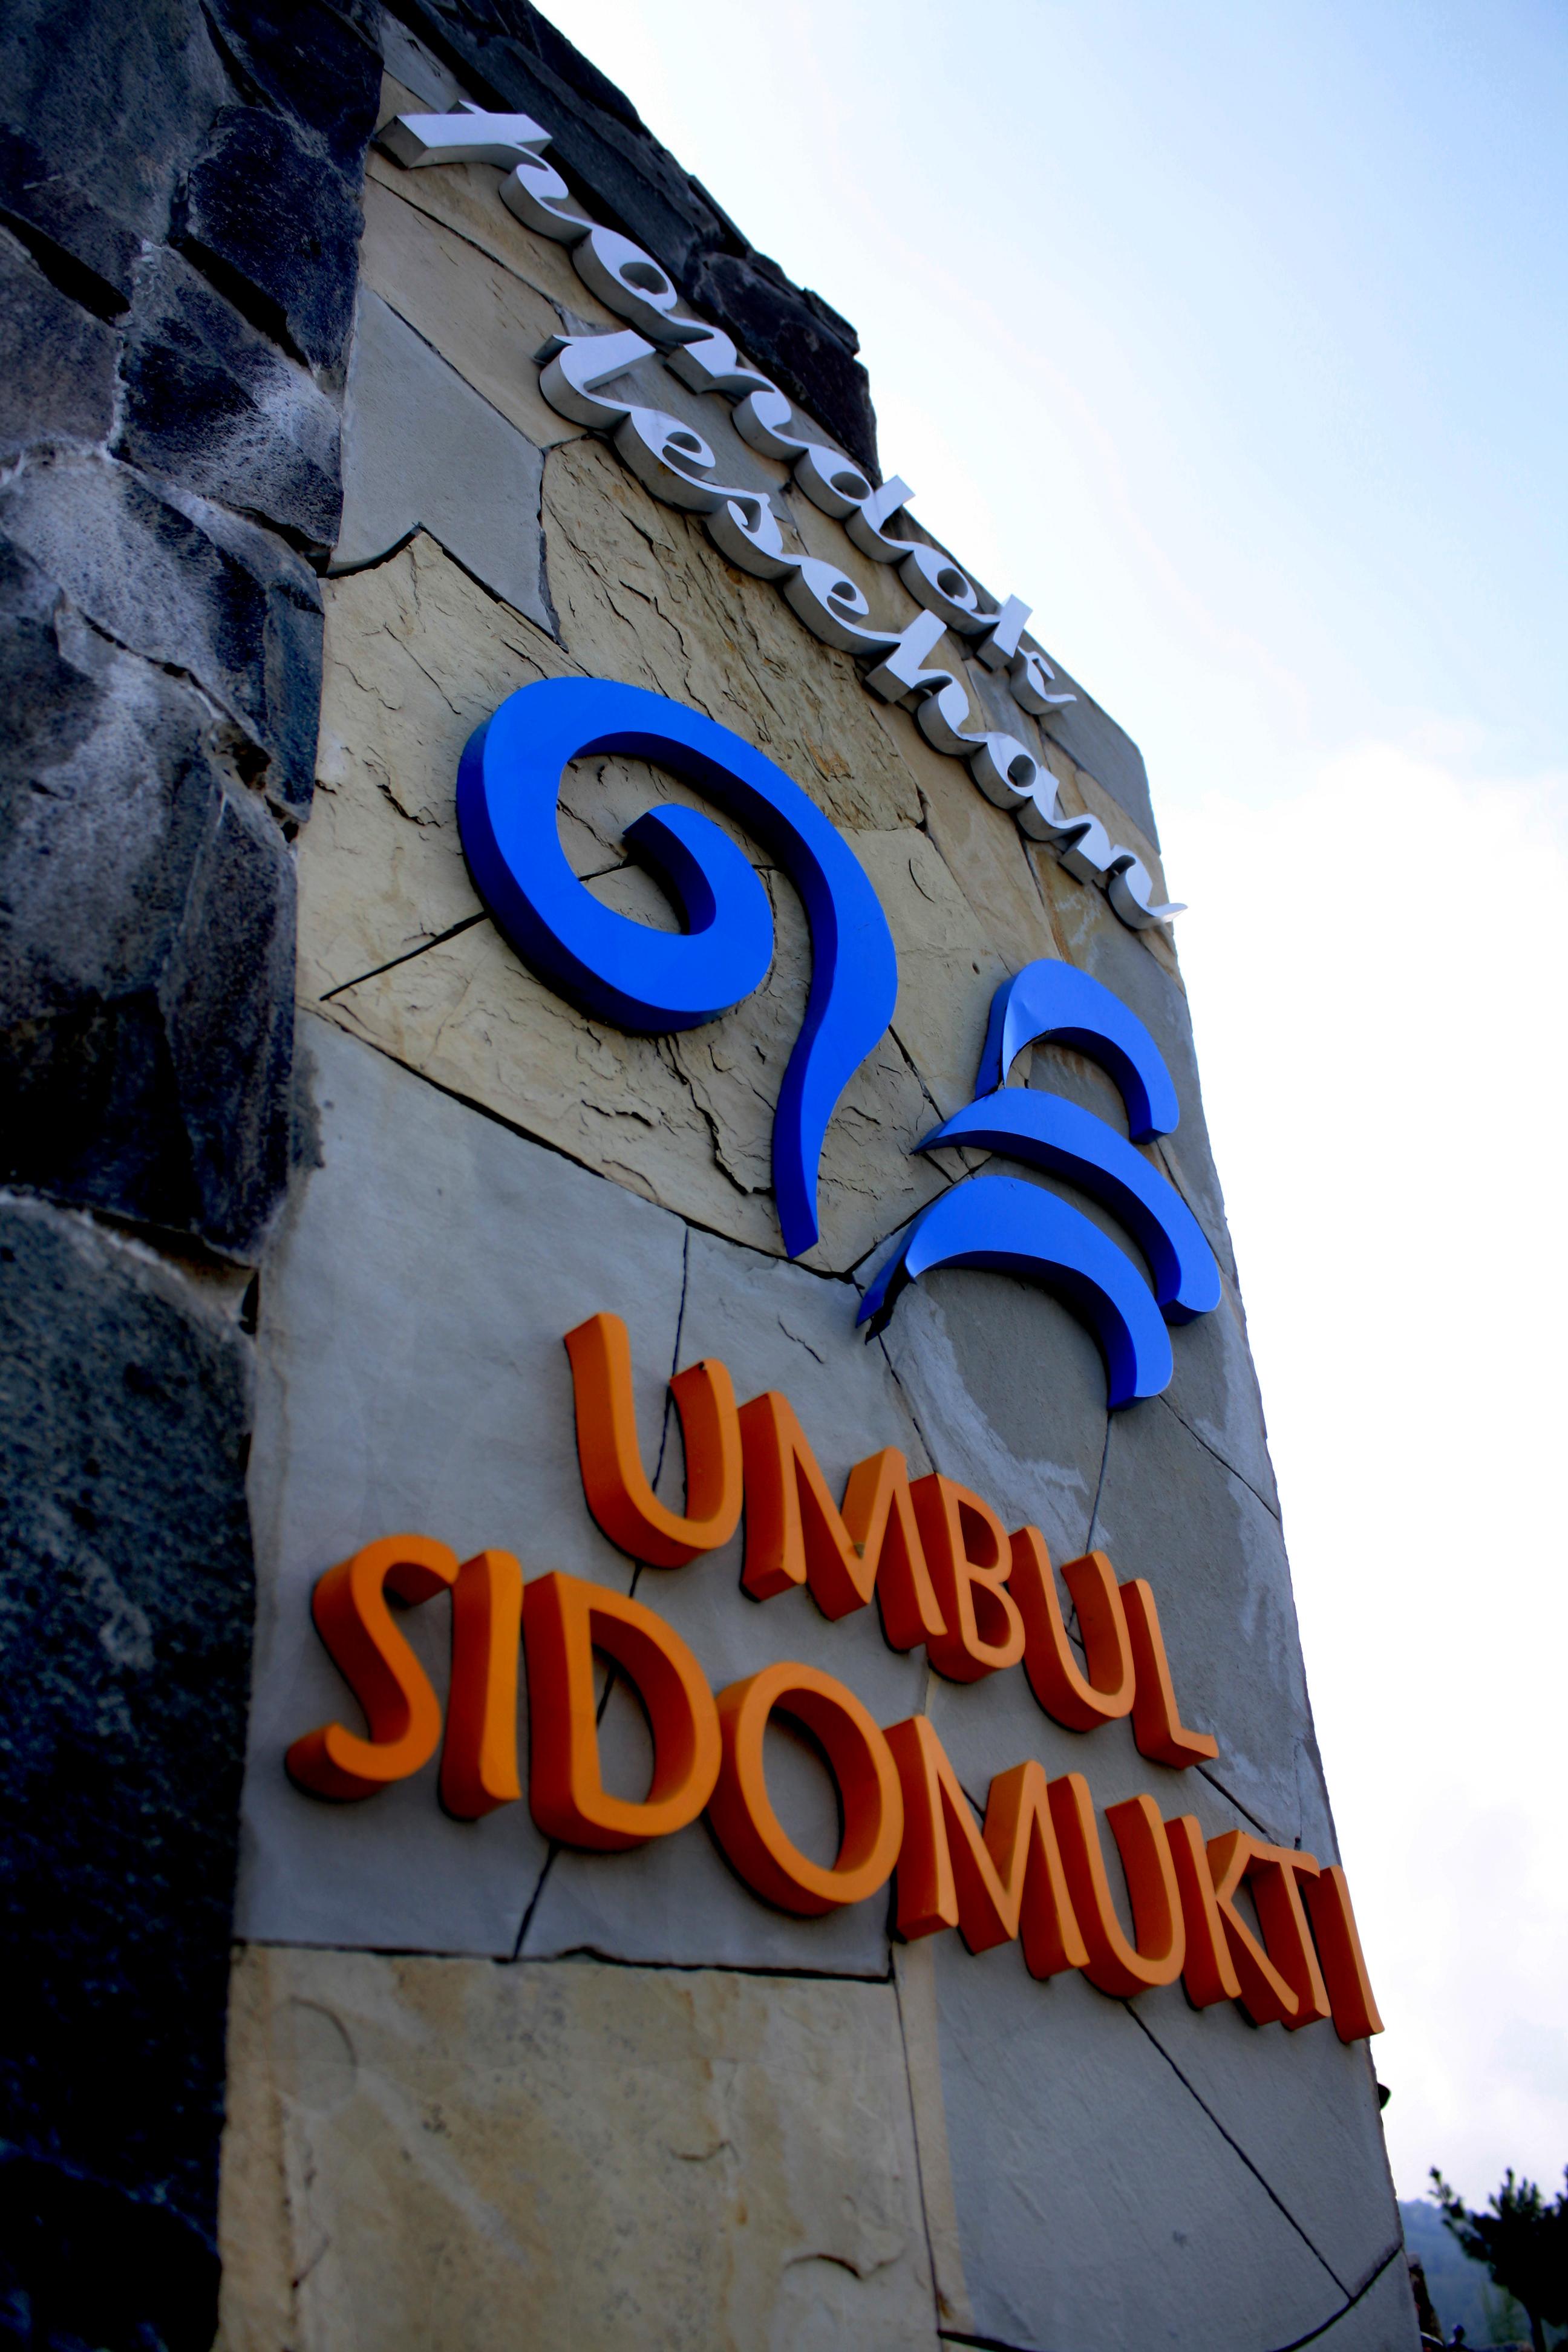 Umbul Sidomukti Semarang Lensakoe Kab